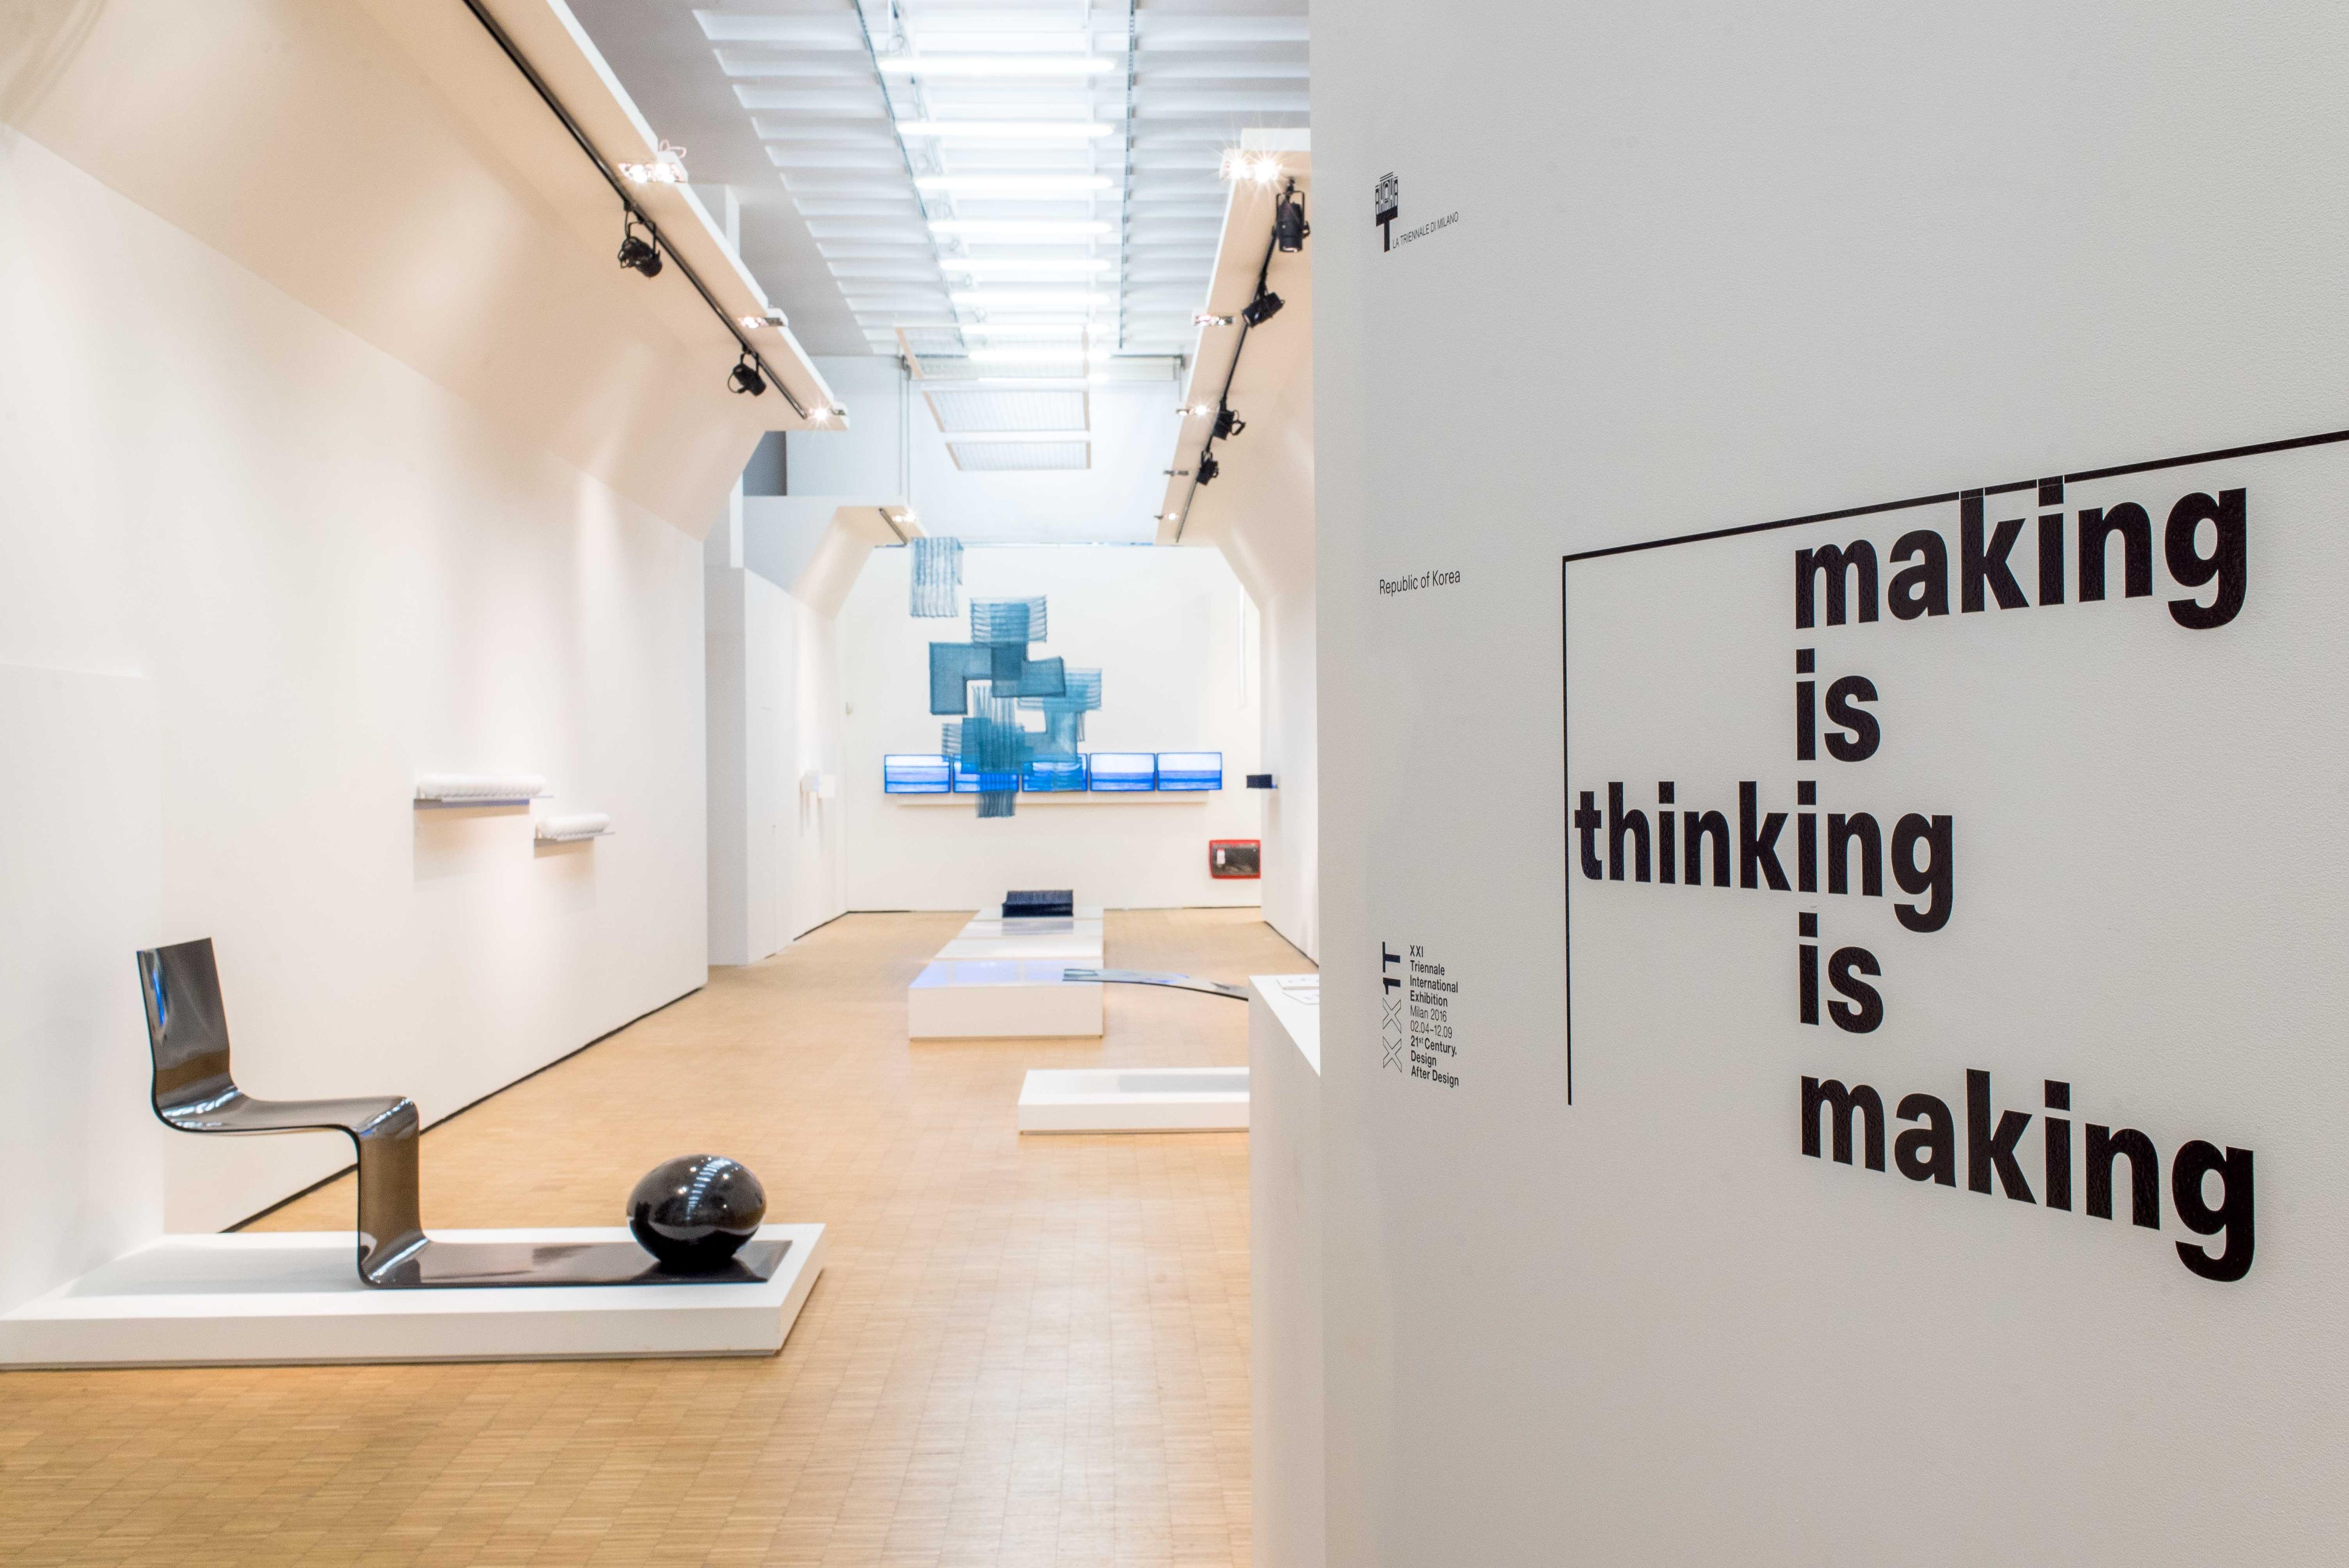 Design Di Interni Milano.Making Is Thinking Is Making Interni Magazine